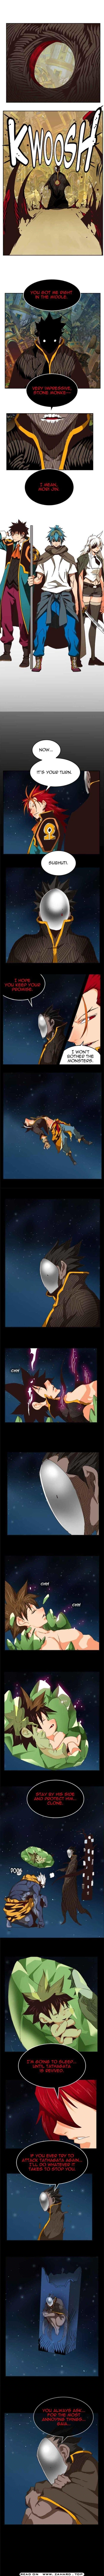 The God Of High School Chapter 525 page 9 - Mangakakalot